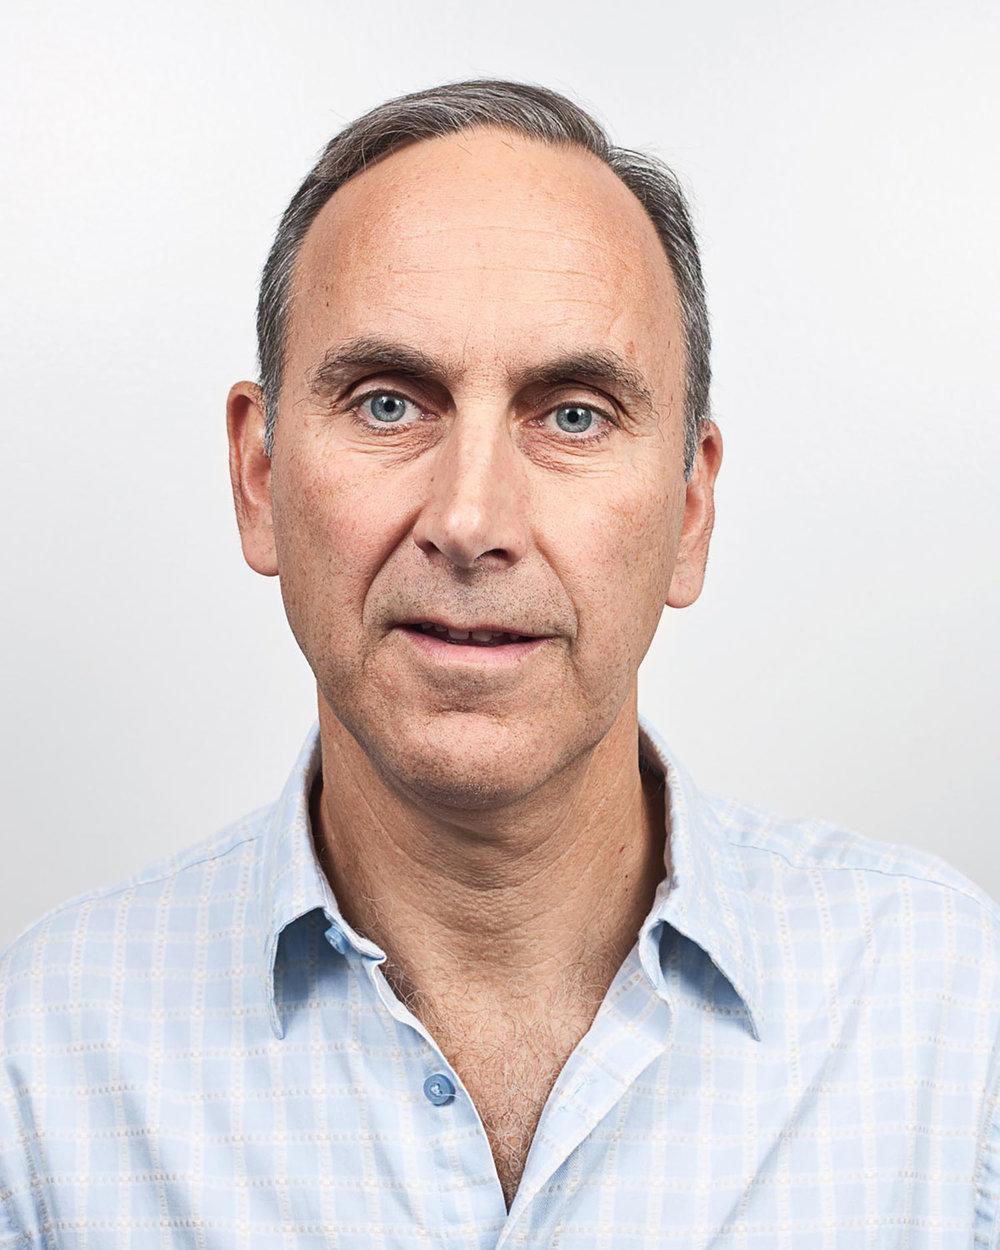 John Grotzinger, JPL Mars Exploration Scientist